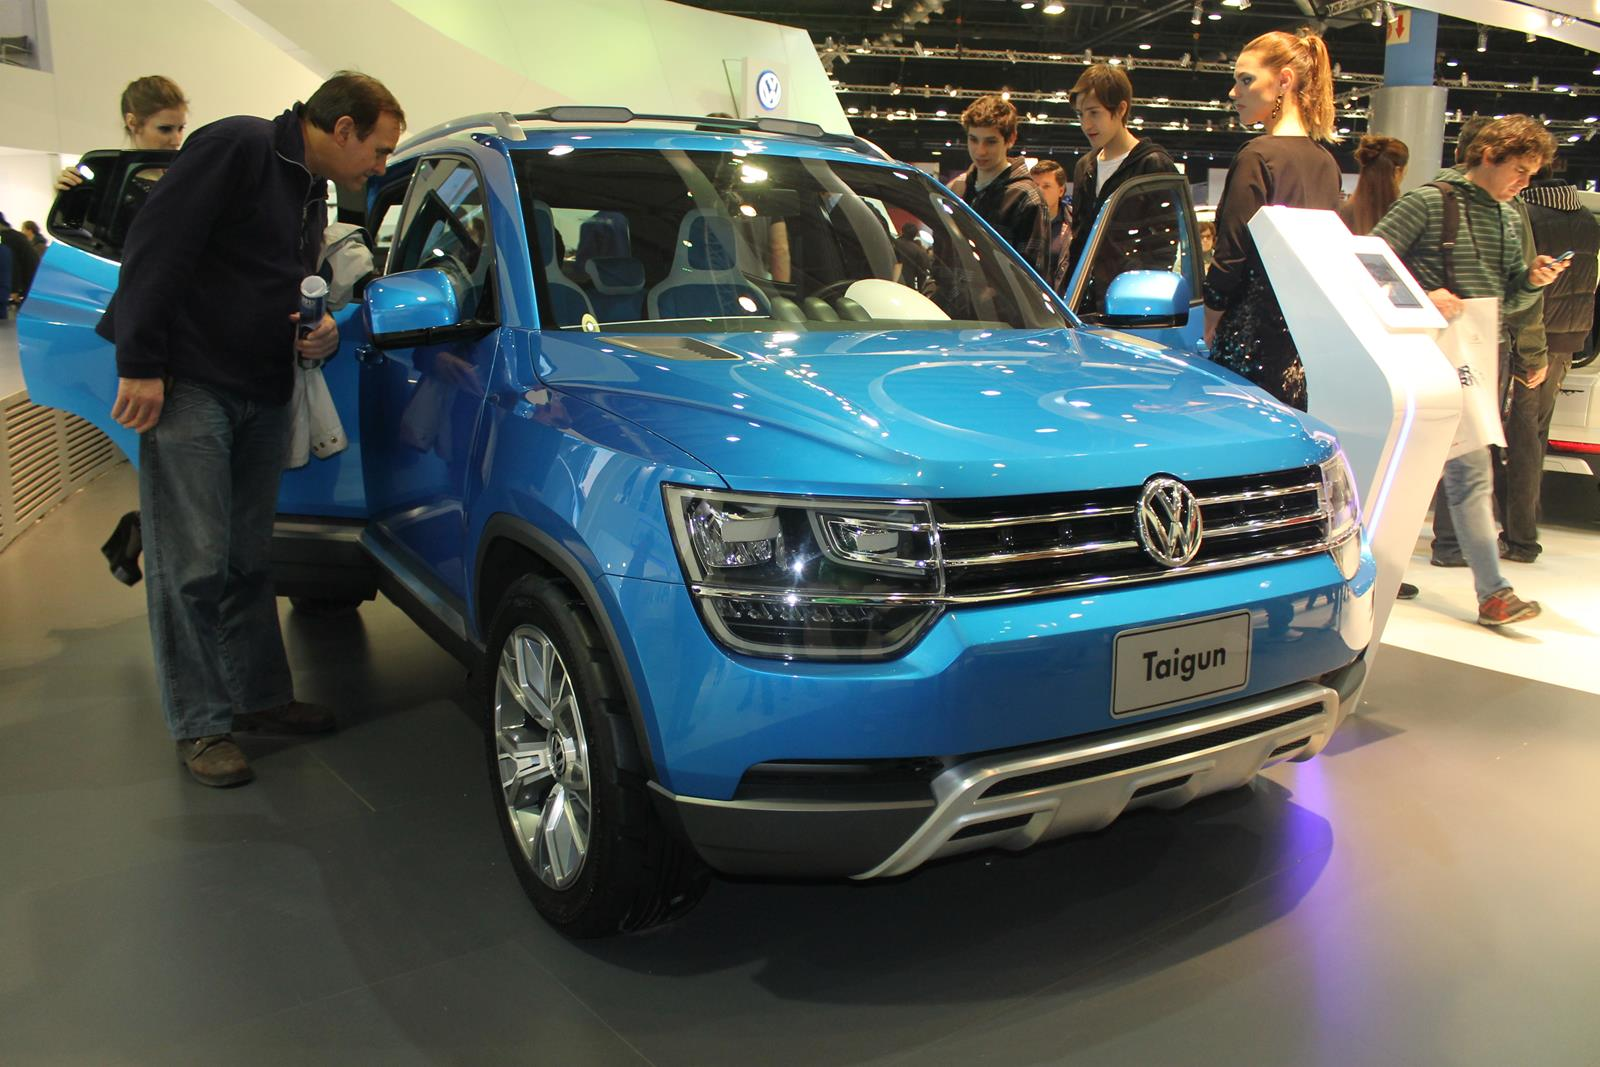 VW-Taigun-Compact-SUV (3)